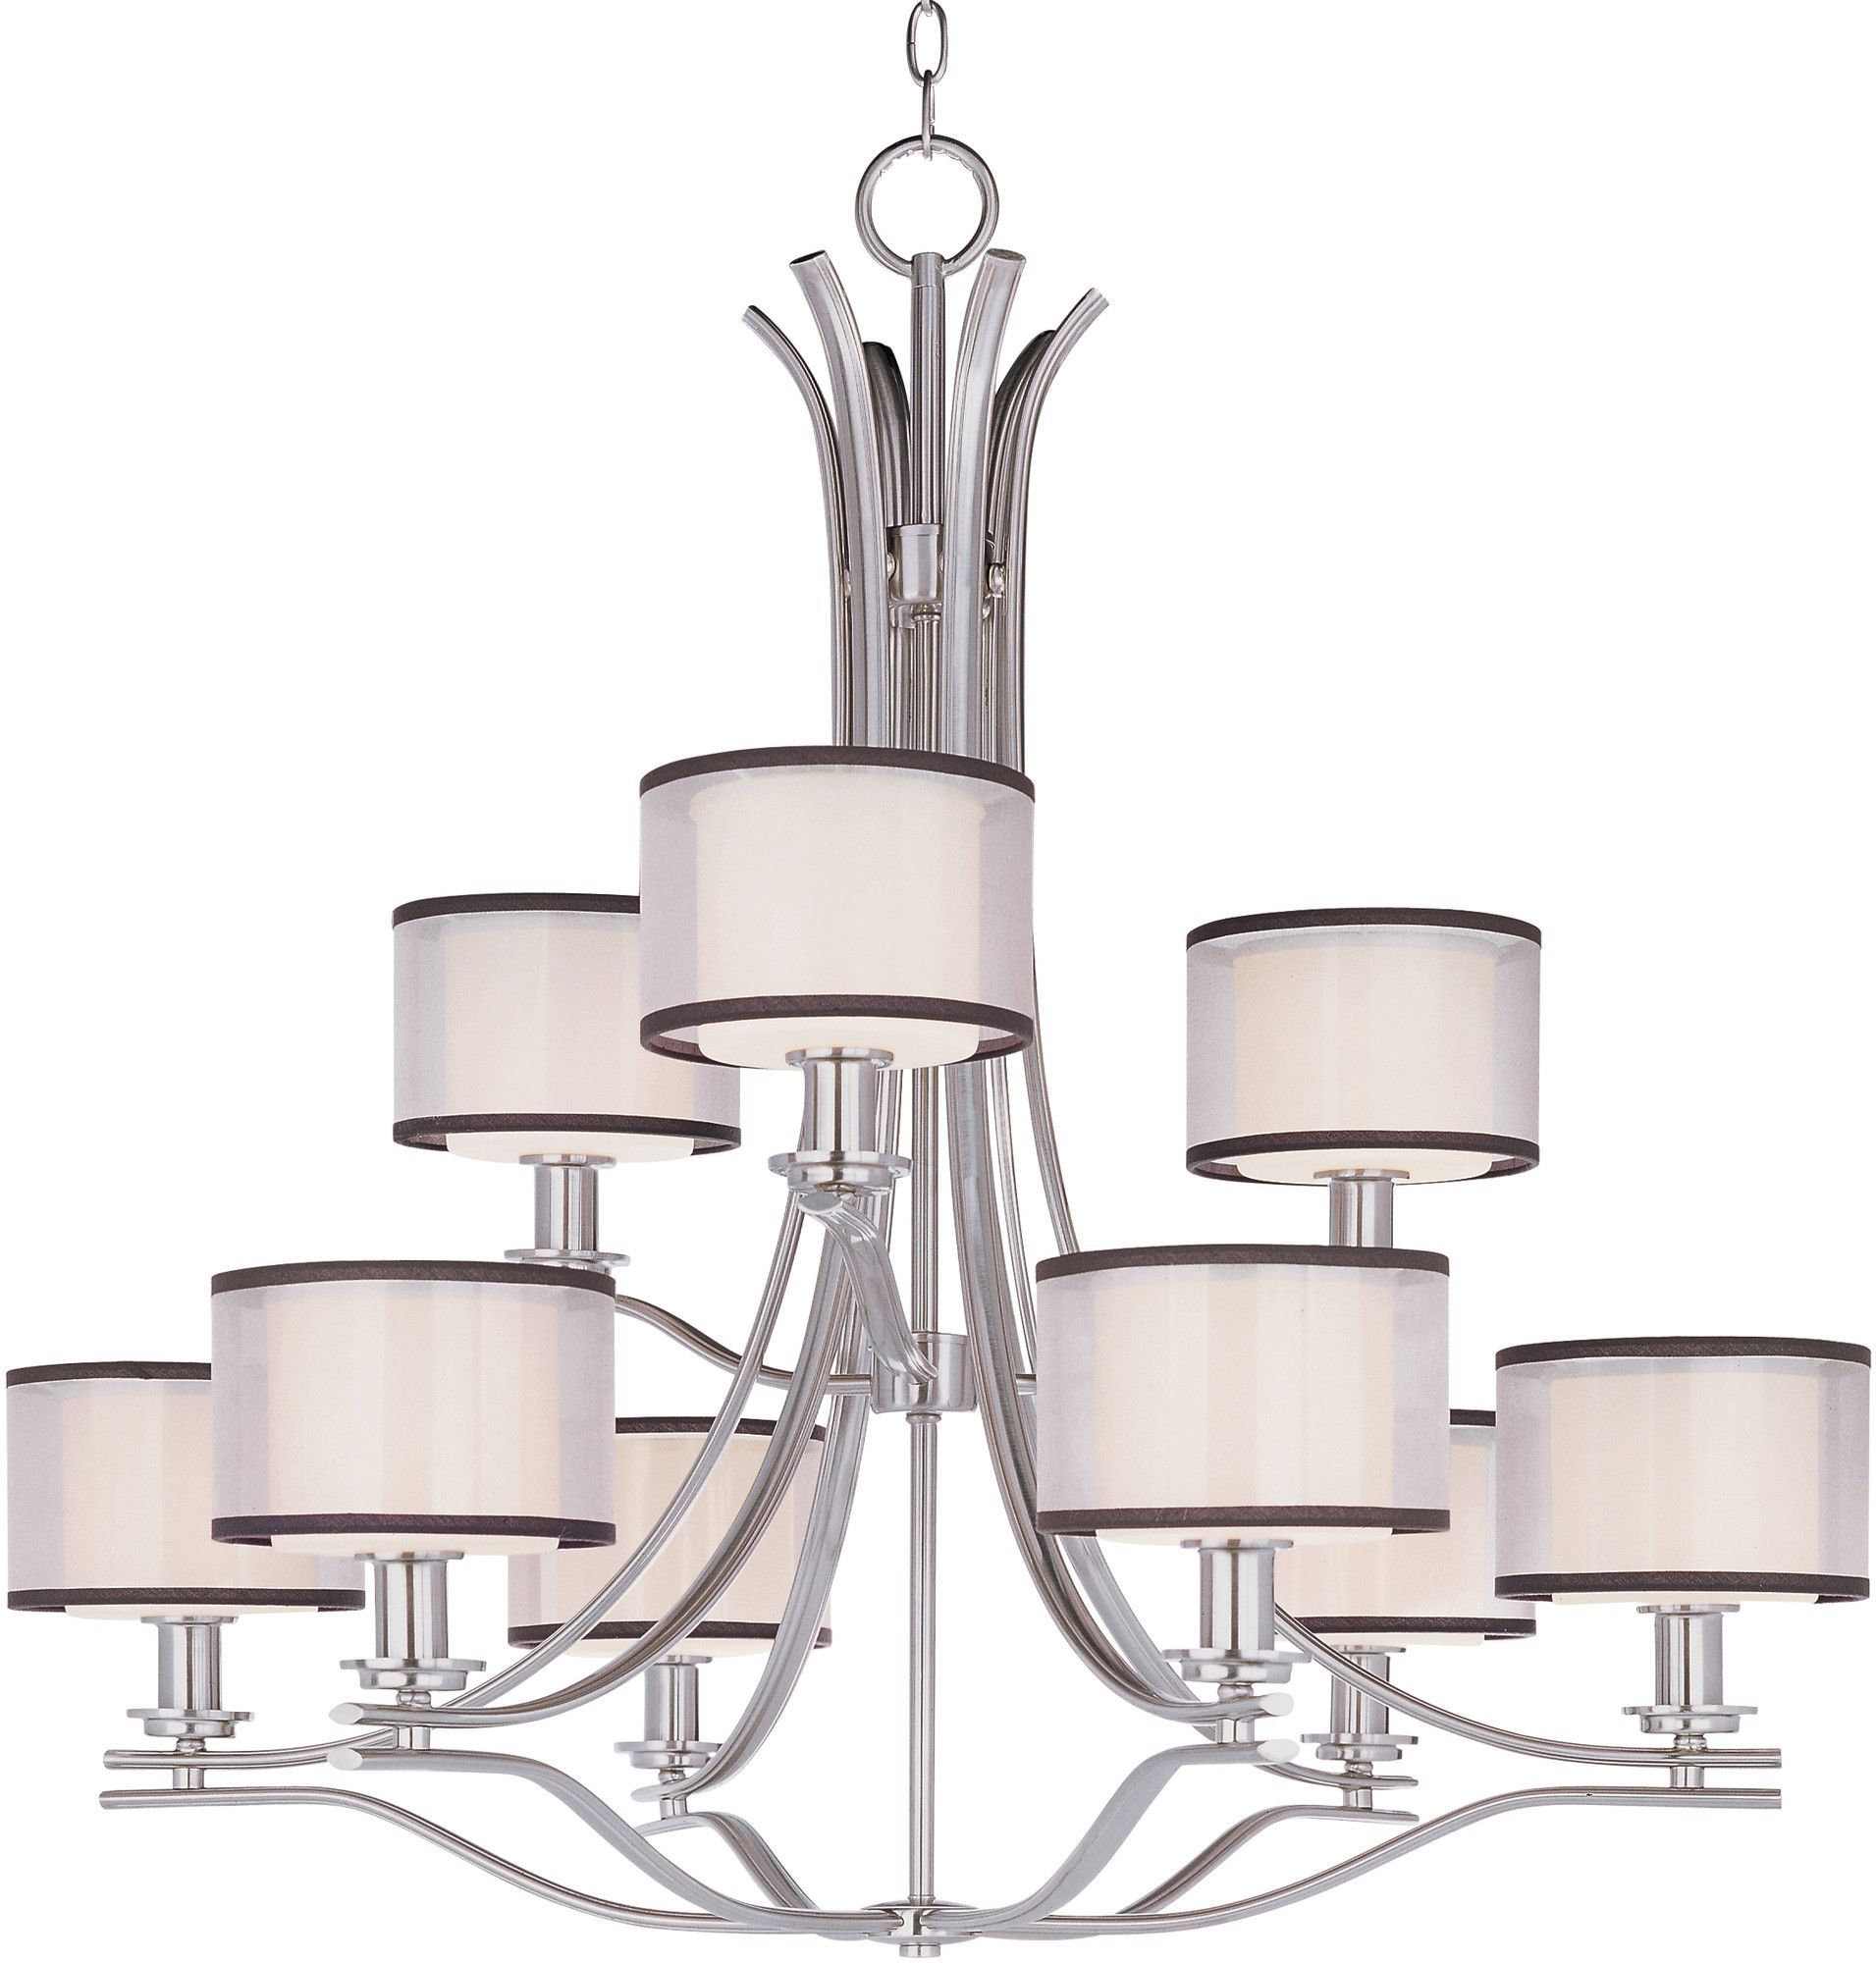 houseknecht 9 light drum chandelier fresh design chandeliers rh pinterest com